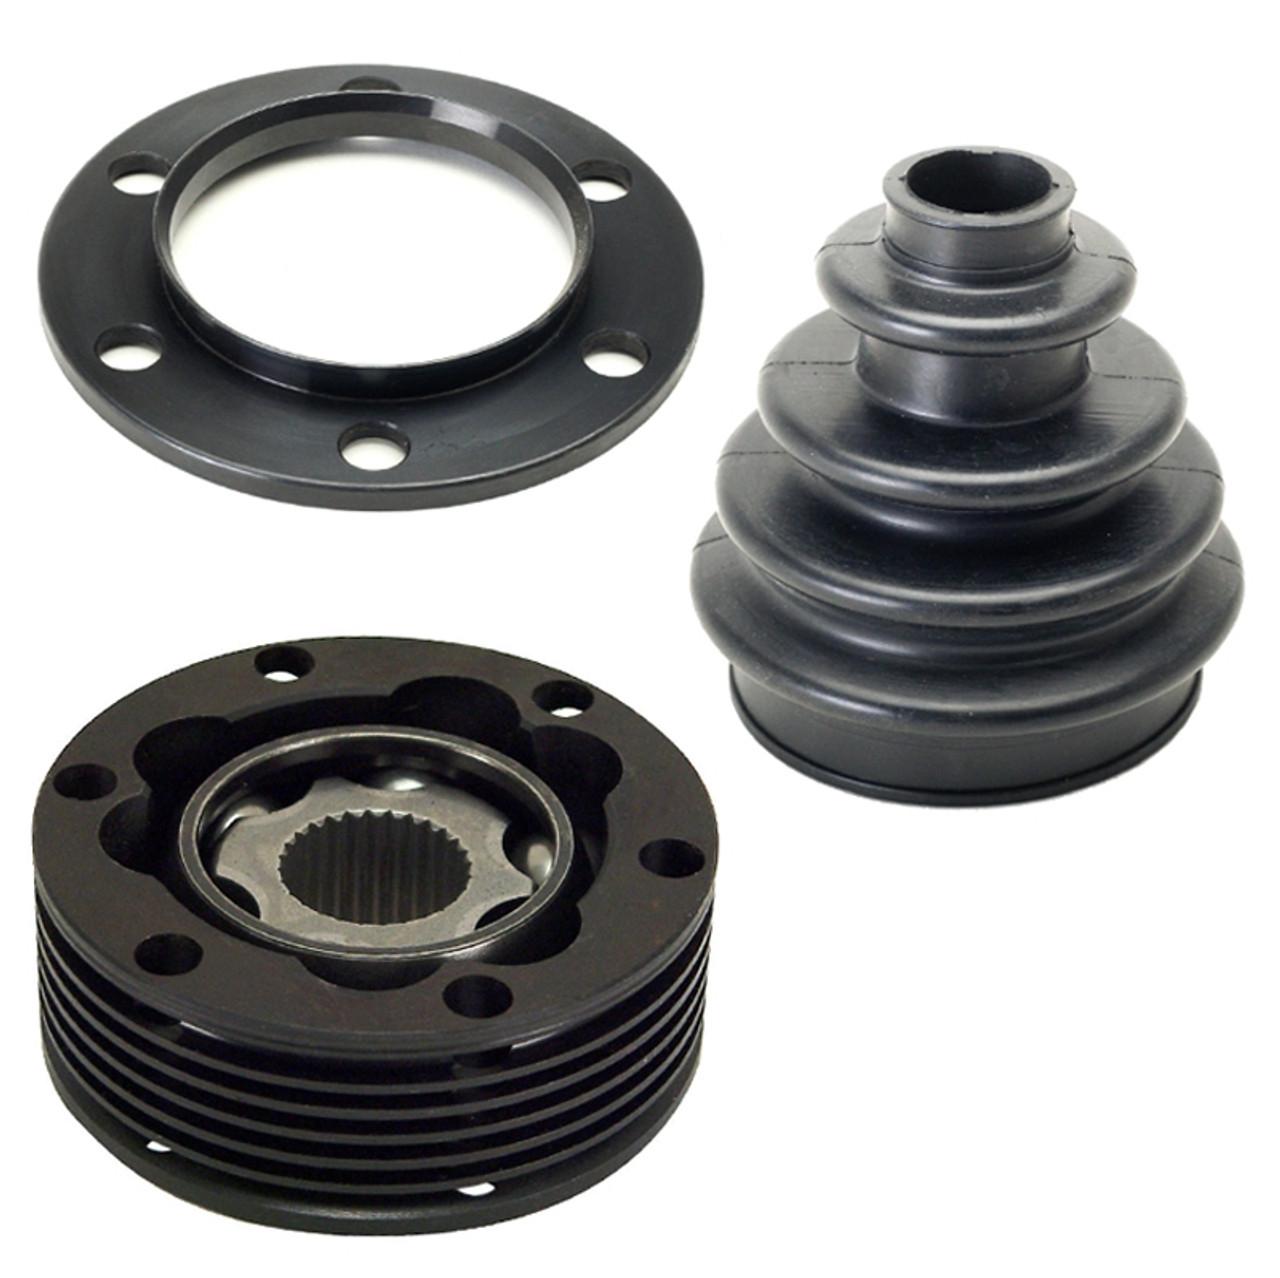 Brakes / Rear Suspension : CV Joints / Axle Boots 930 - Dune